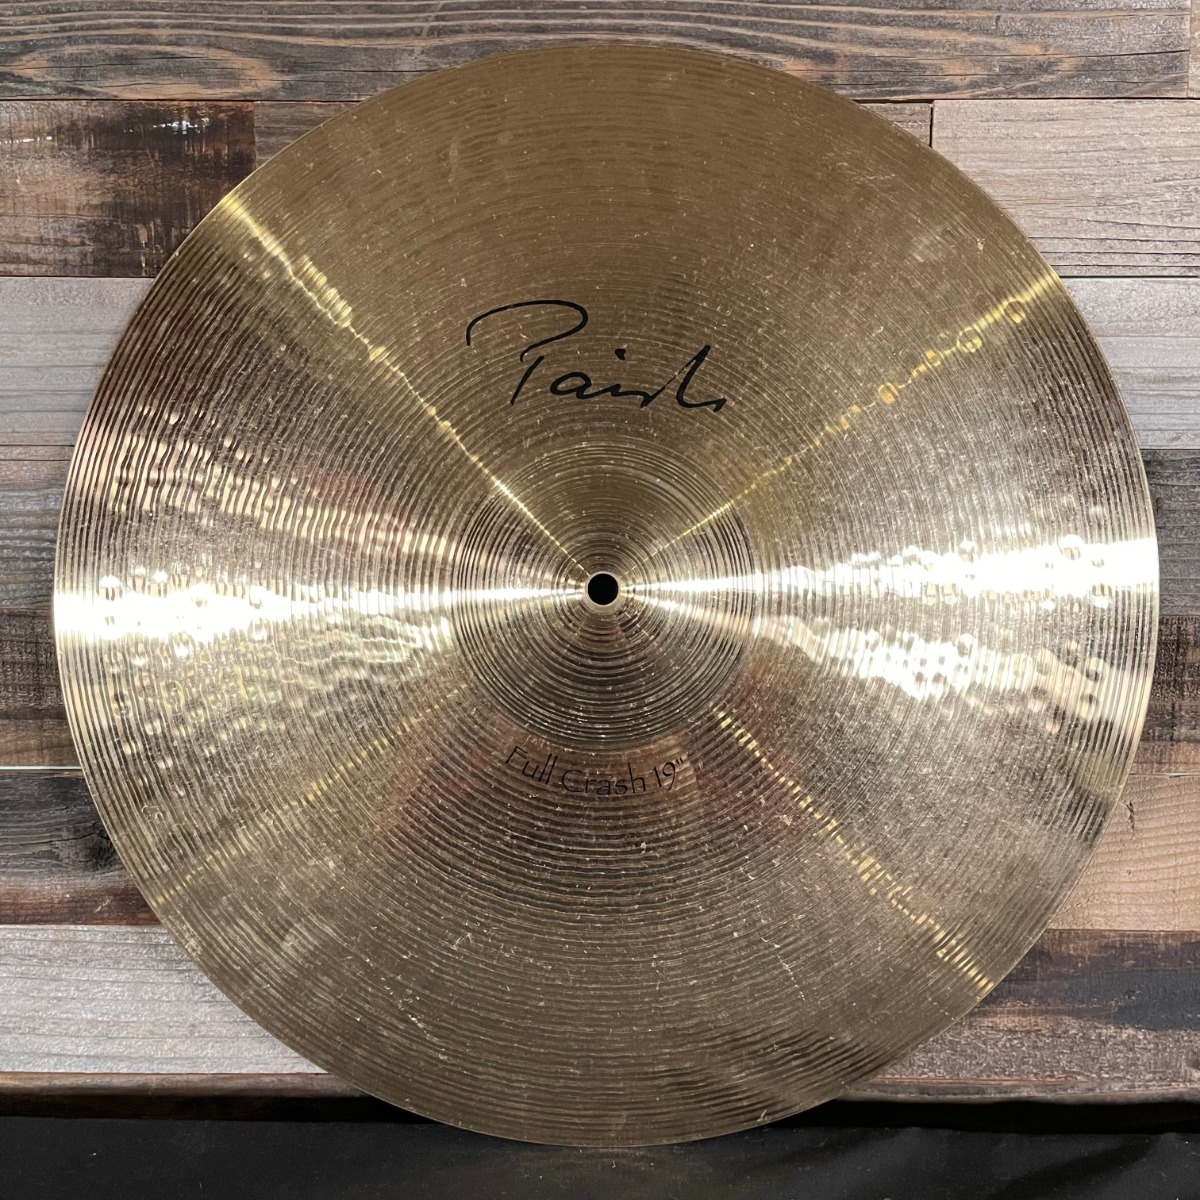 Used Gretsch Broadkaster 4pc Drum Set Satin Copper   eBay